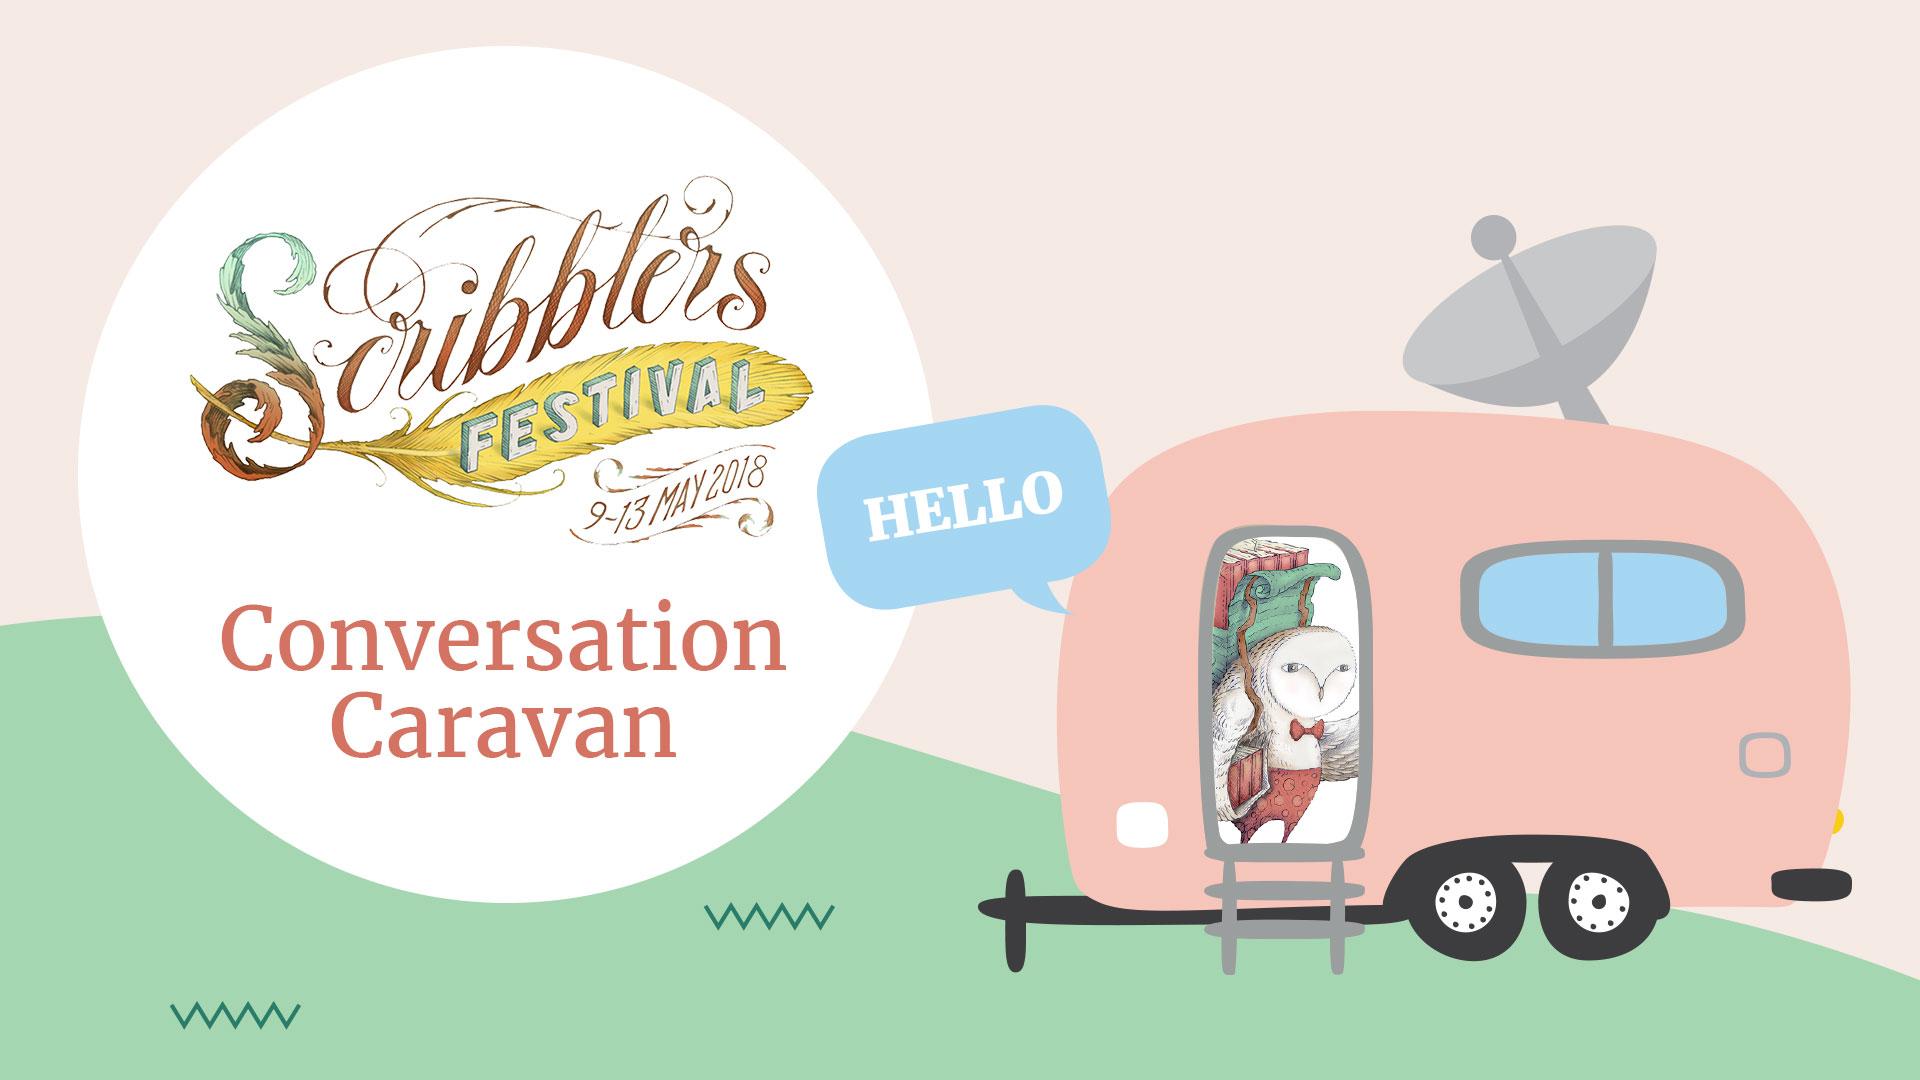 Scribbler's Festival Conversation Caravan